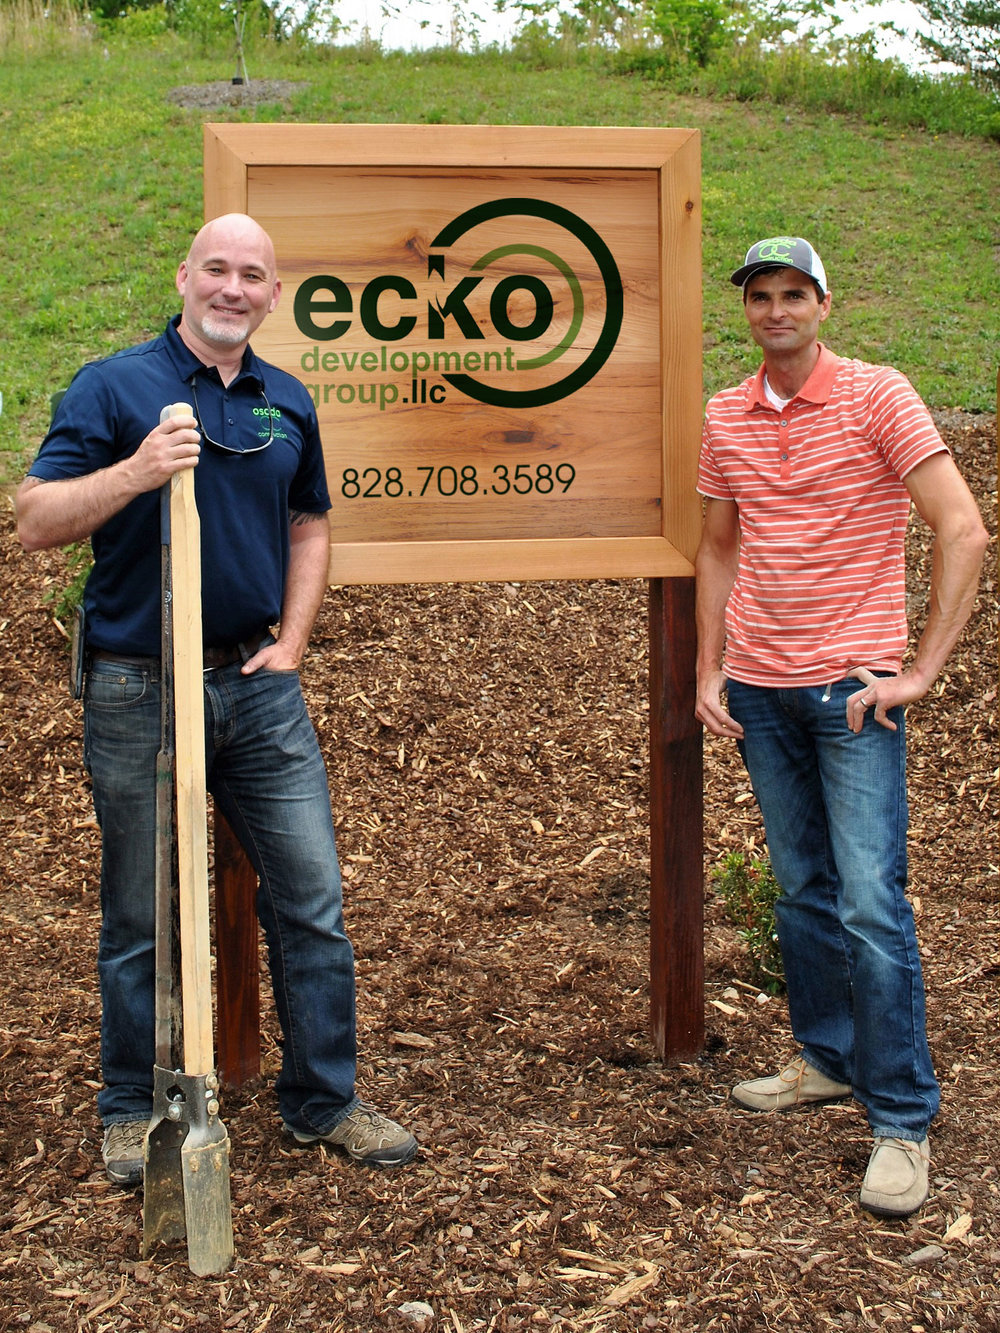 ABOVE:  Robi Eckley and Matt Osada